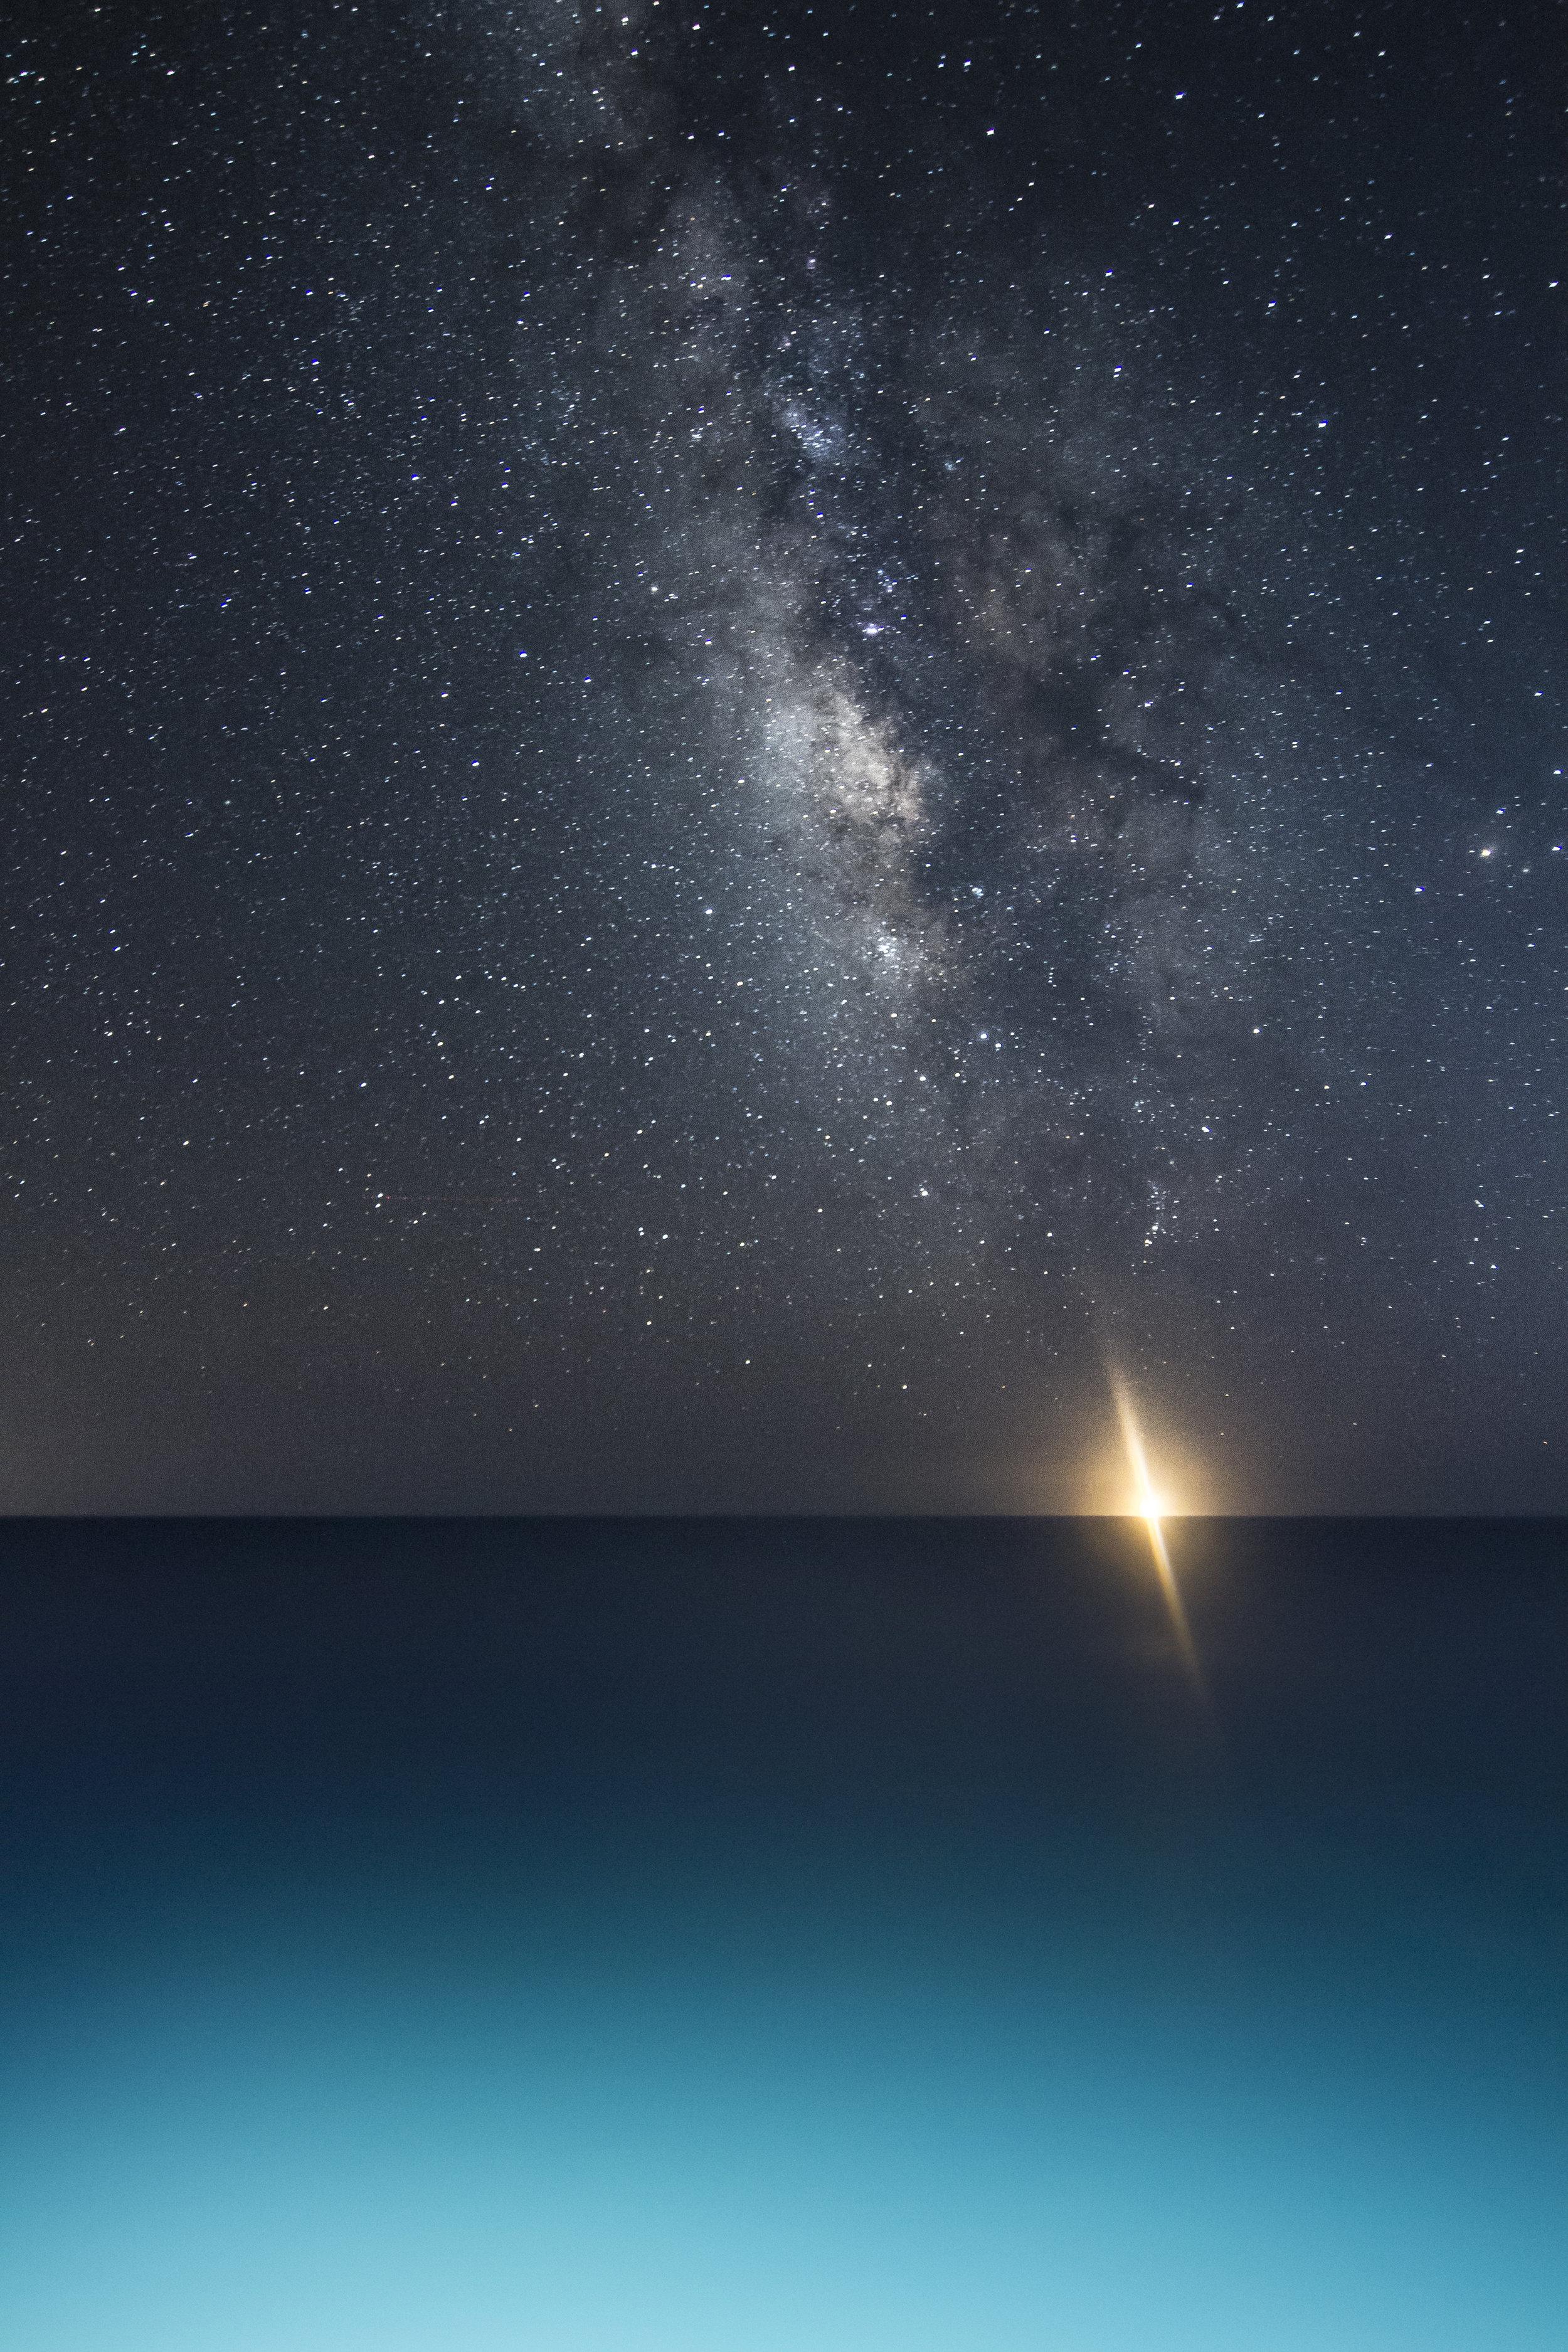 DW_AstroPhoto004.jpg